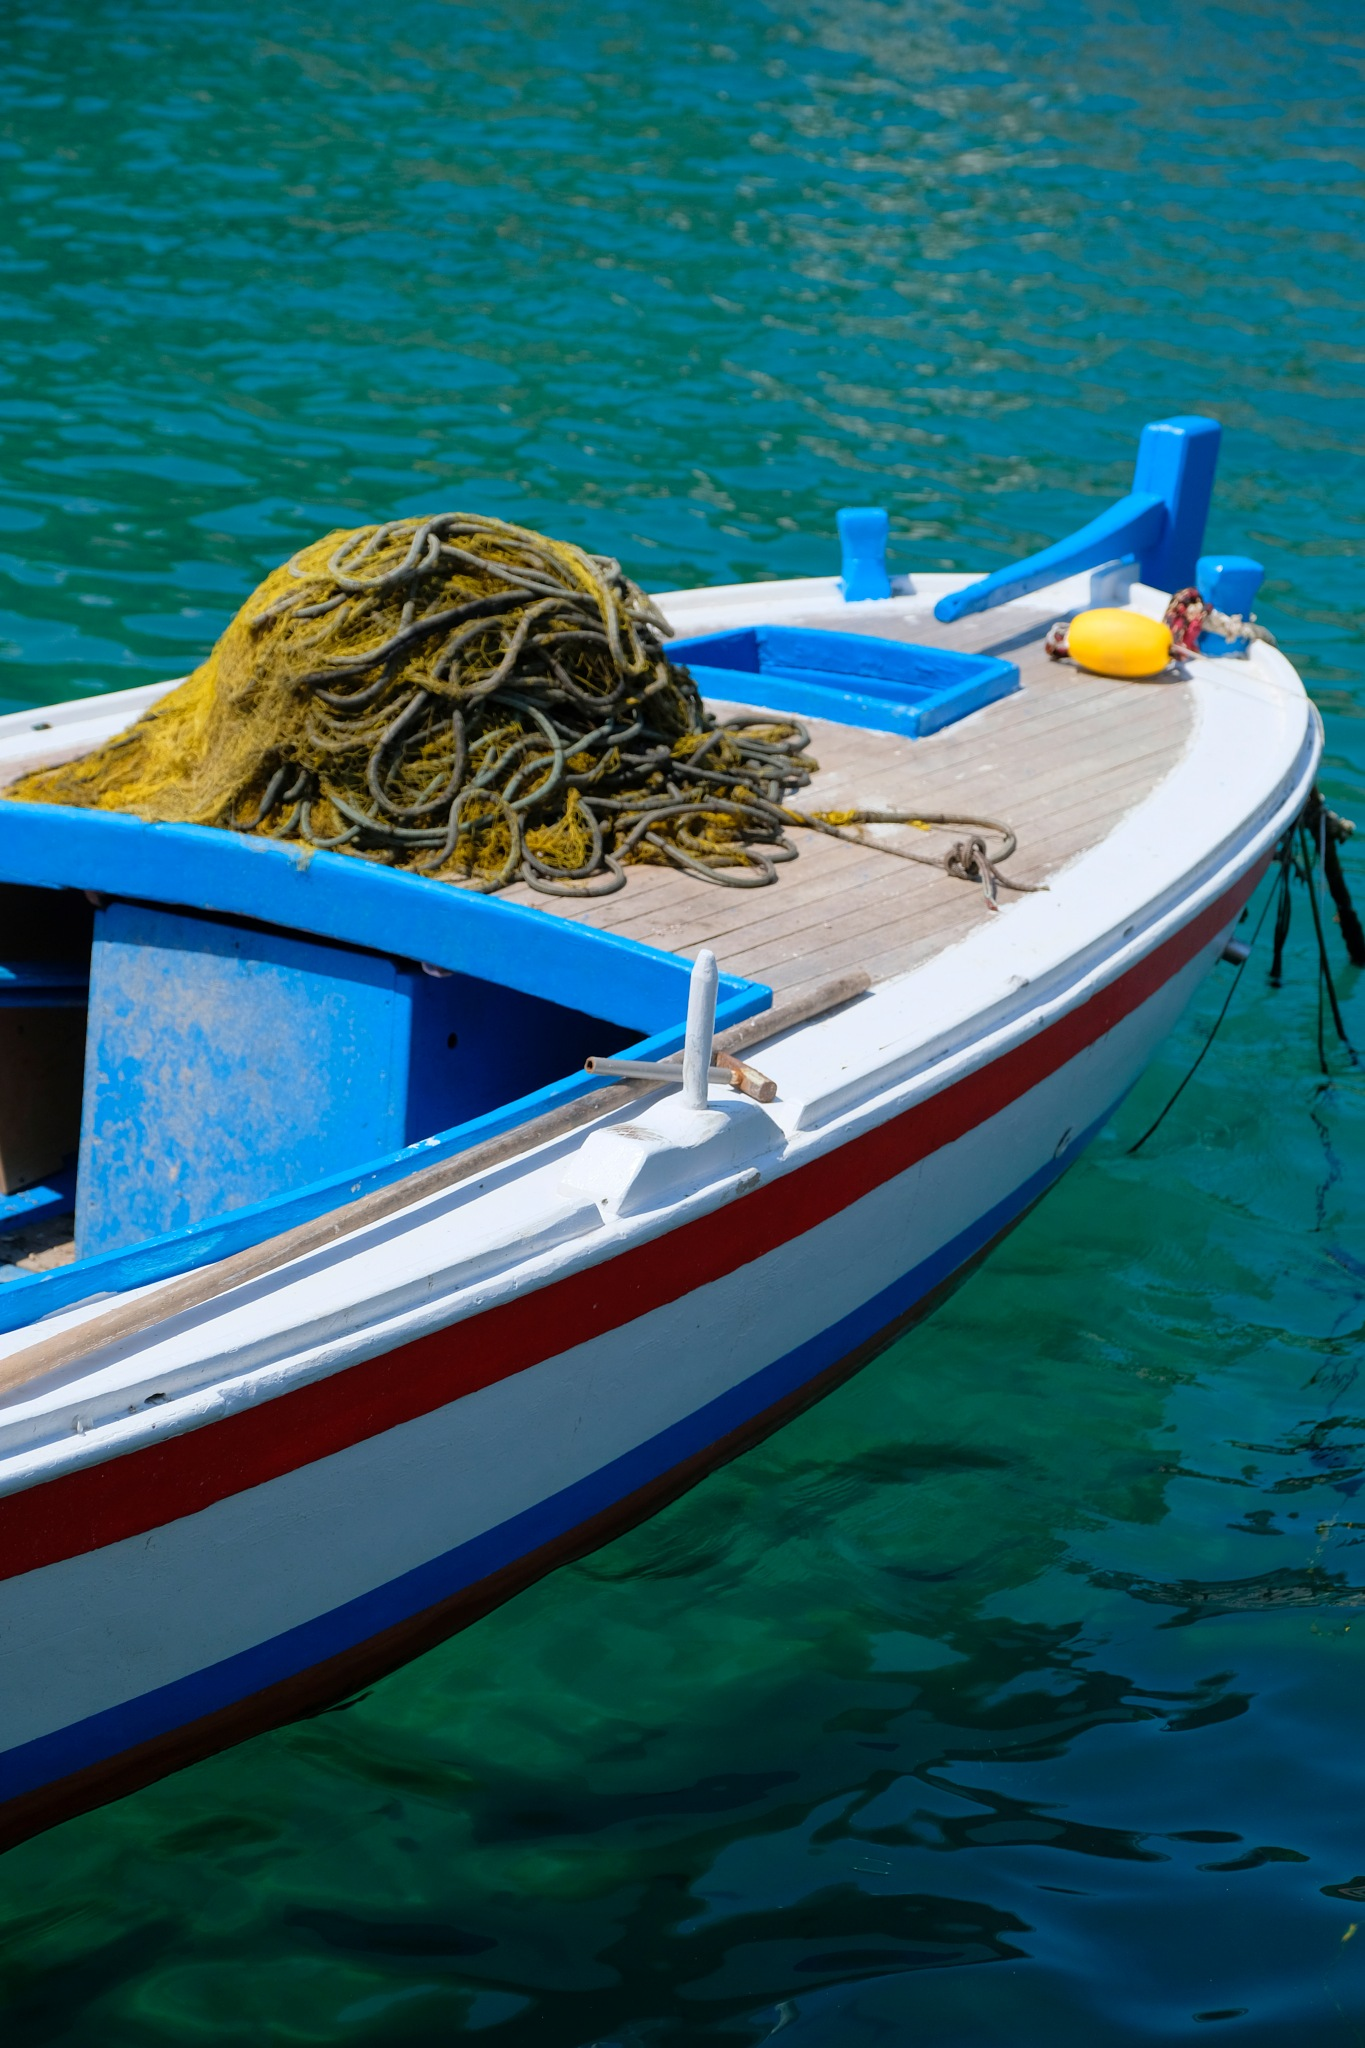 Summer in Croatia :BRAC ISLAND by Goran Jorganovich